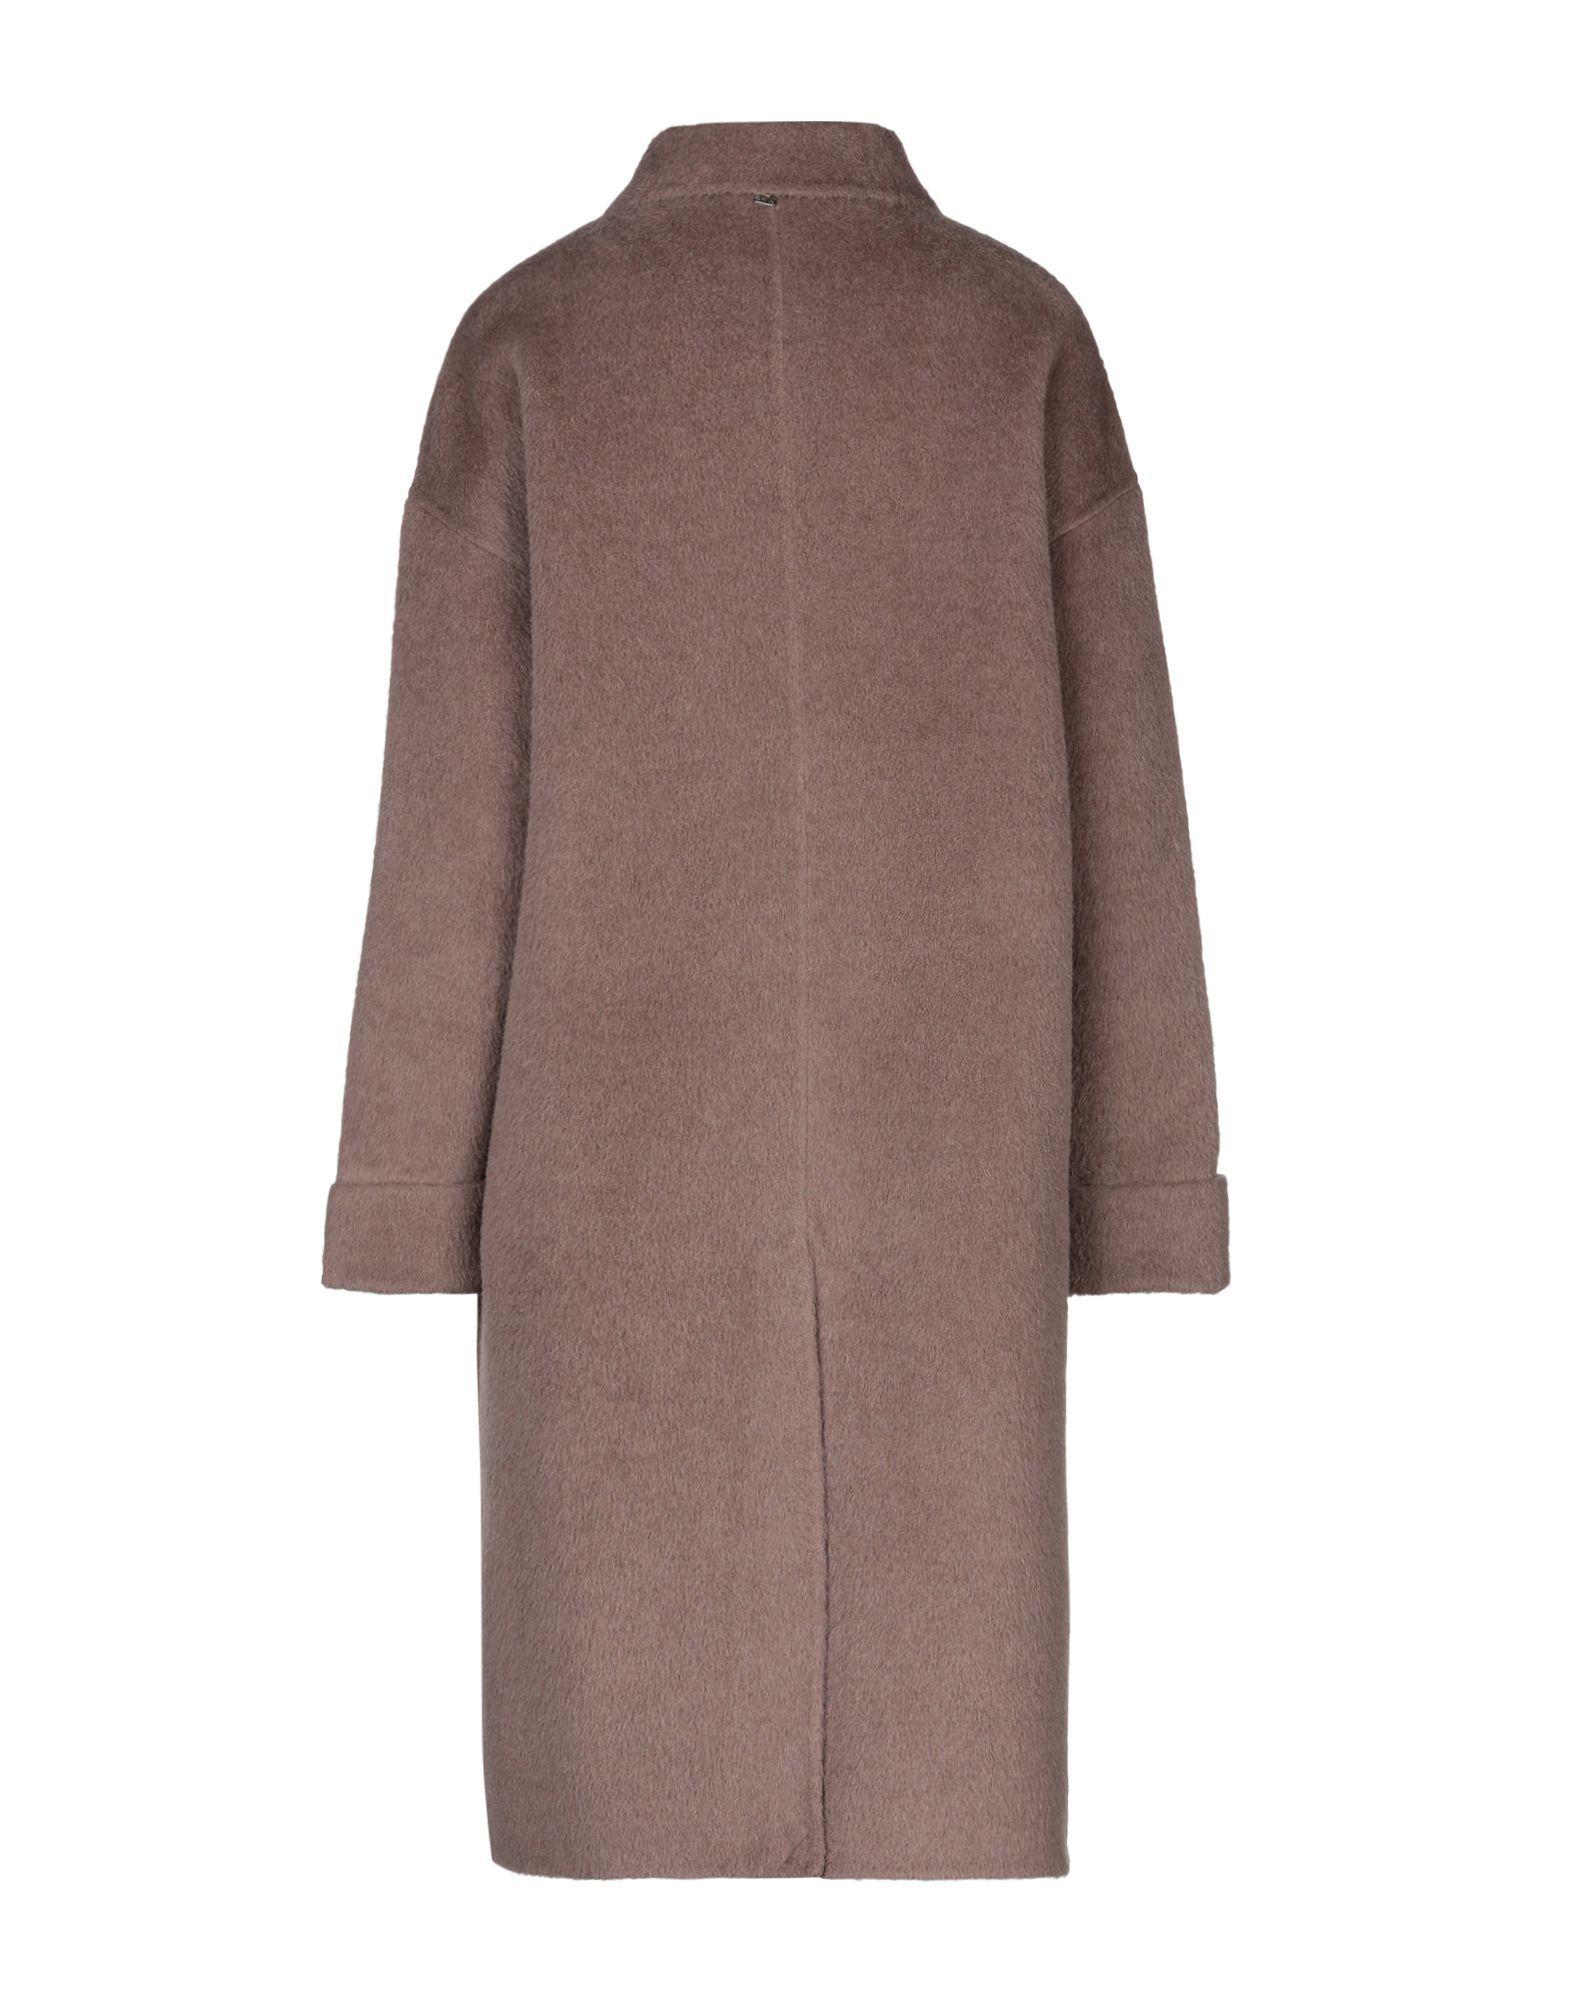 Manila Grace Khaki Wool Overcoat